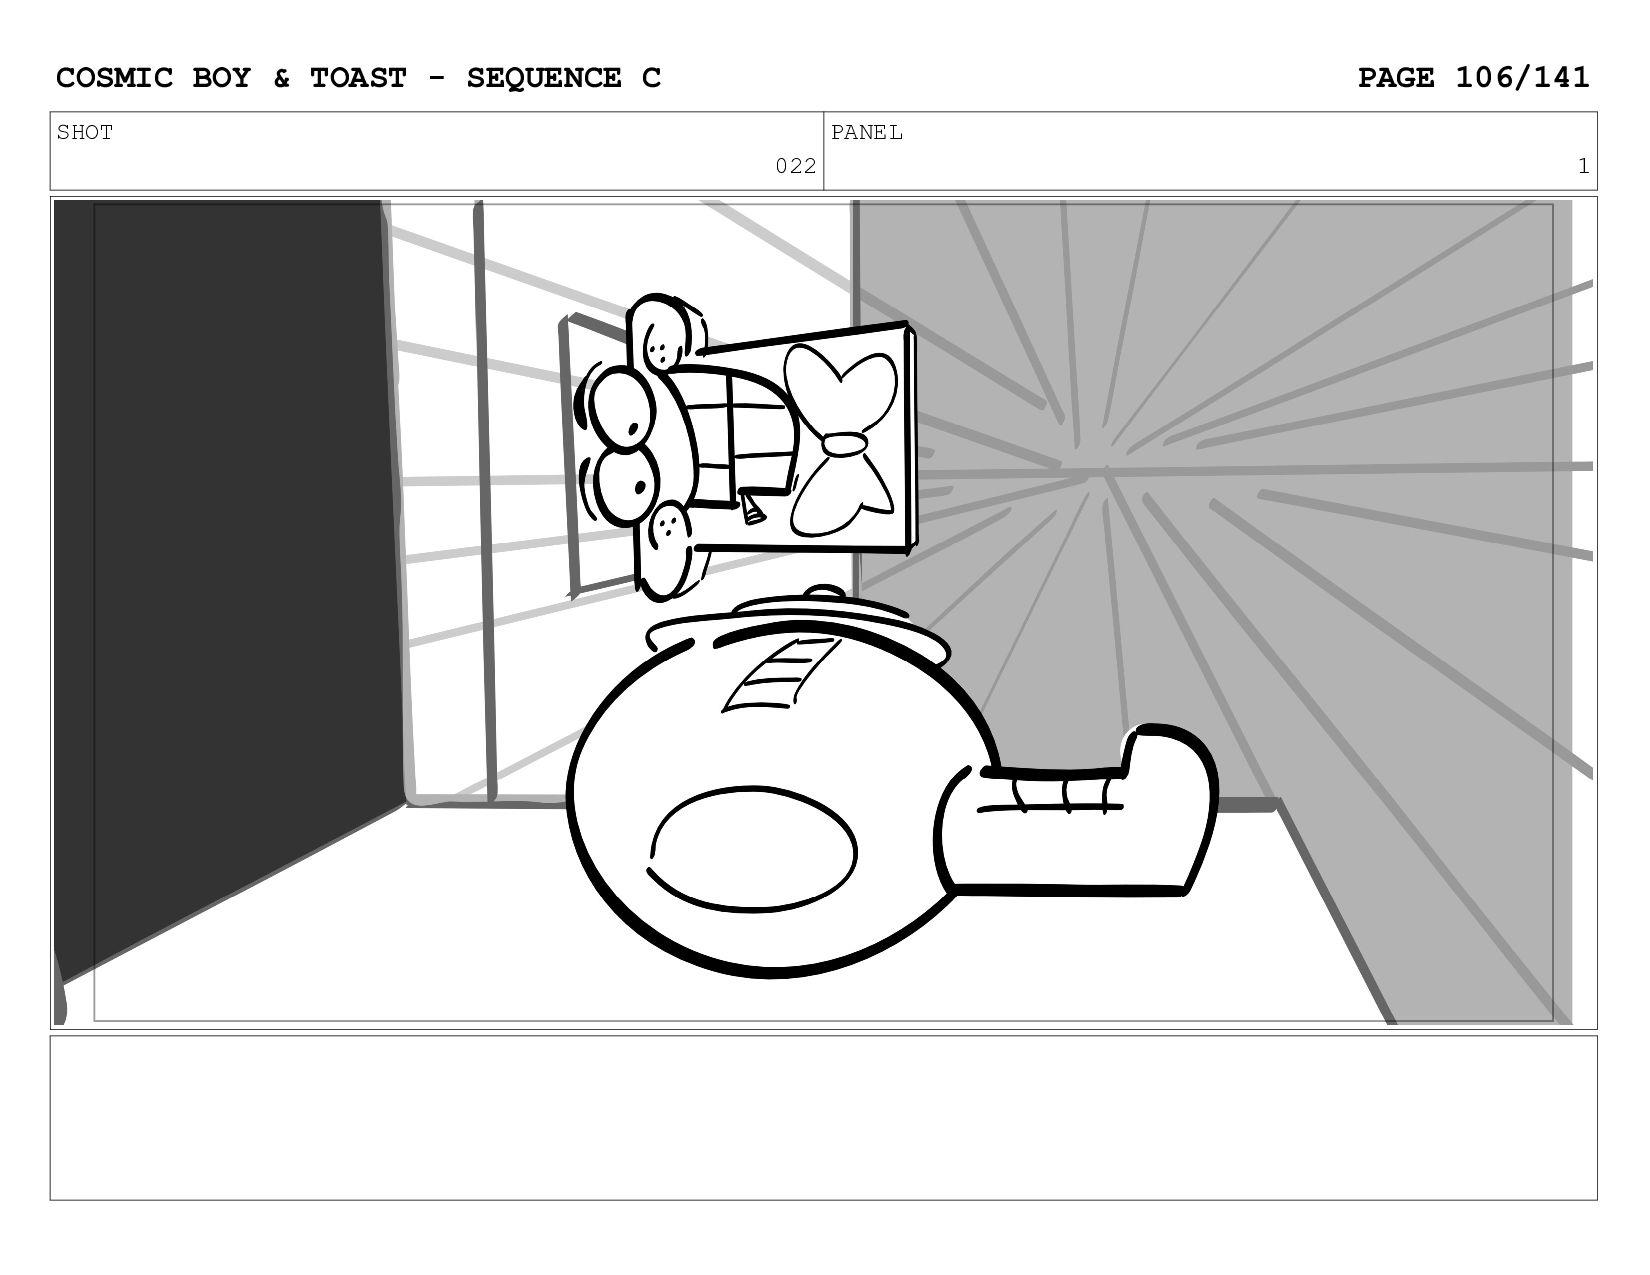 SCENE 022 PANEL A COSMIC BOY & TOAST - SEQUENCE...